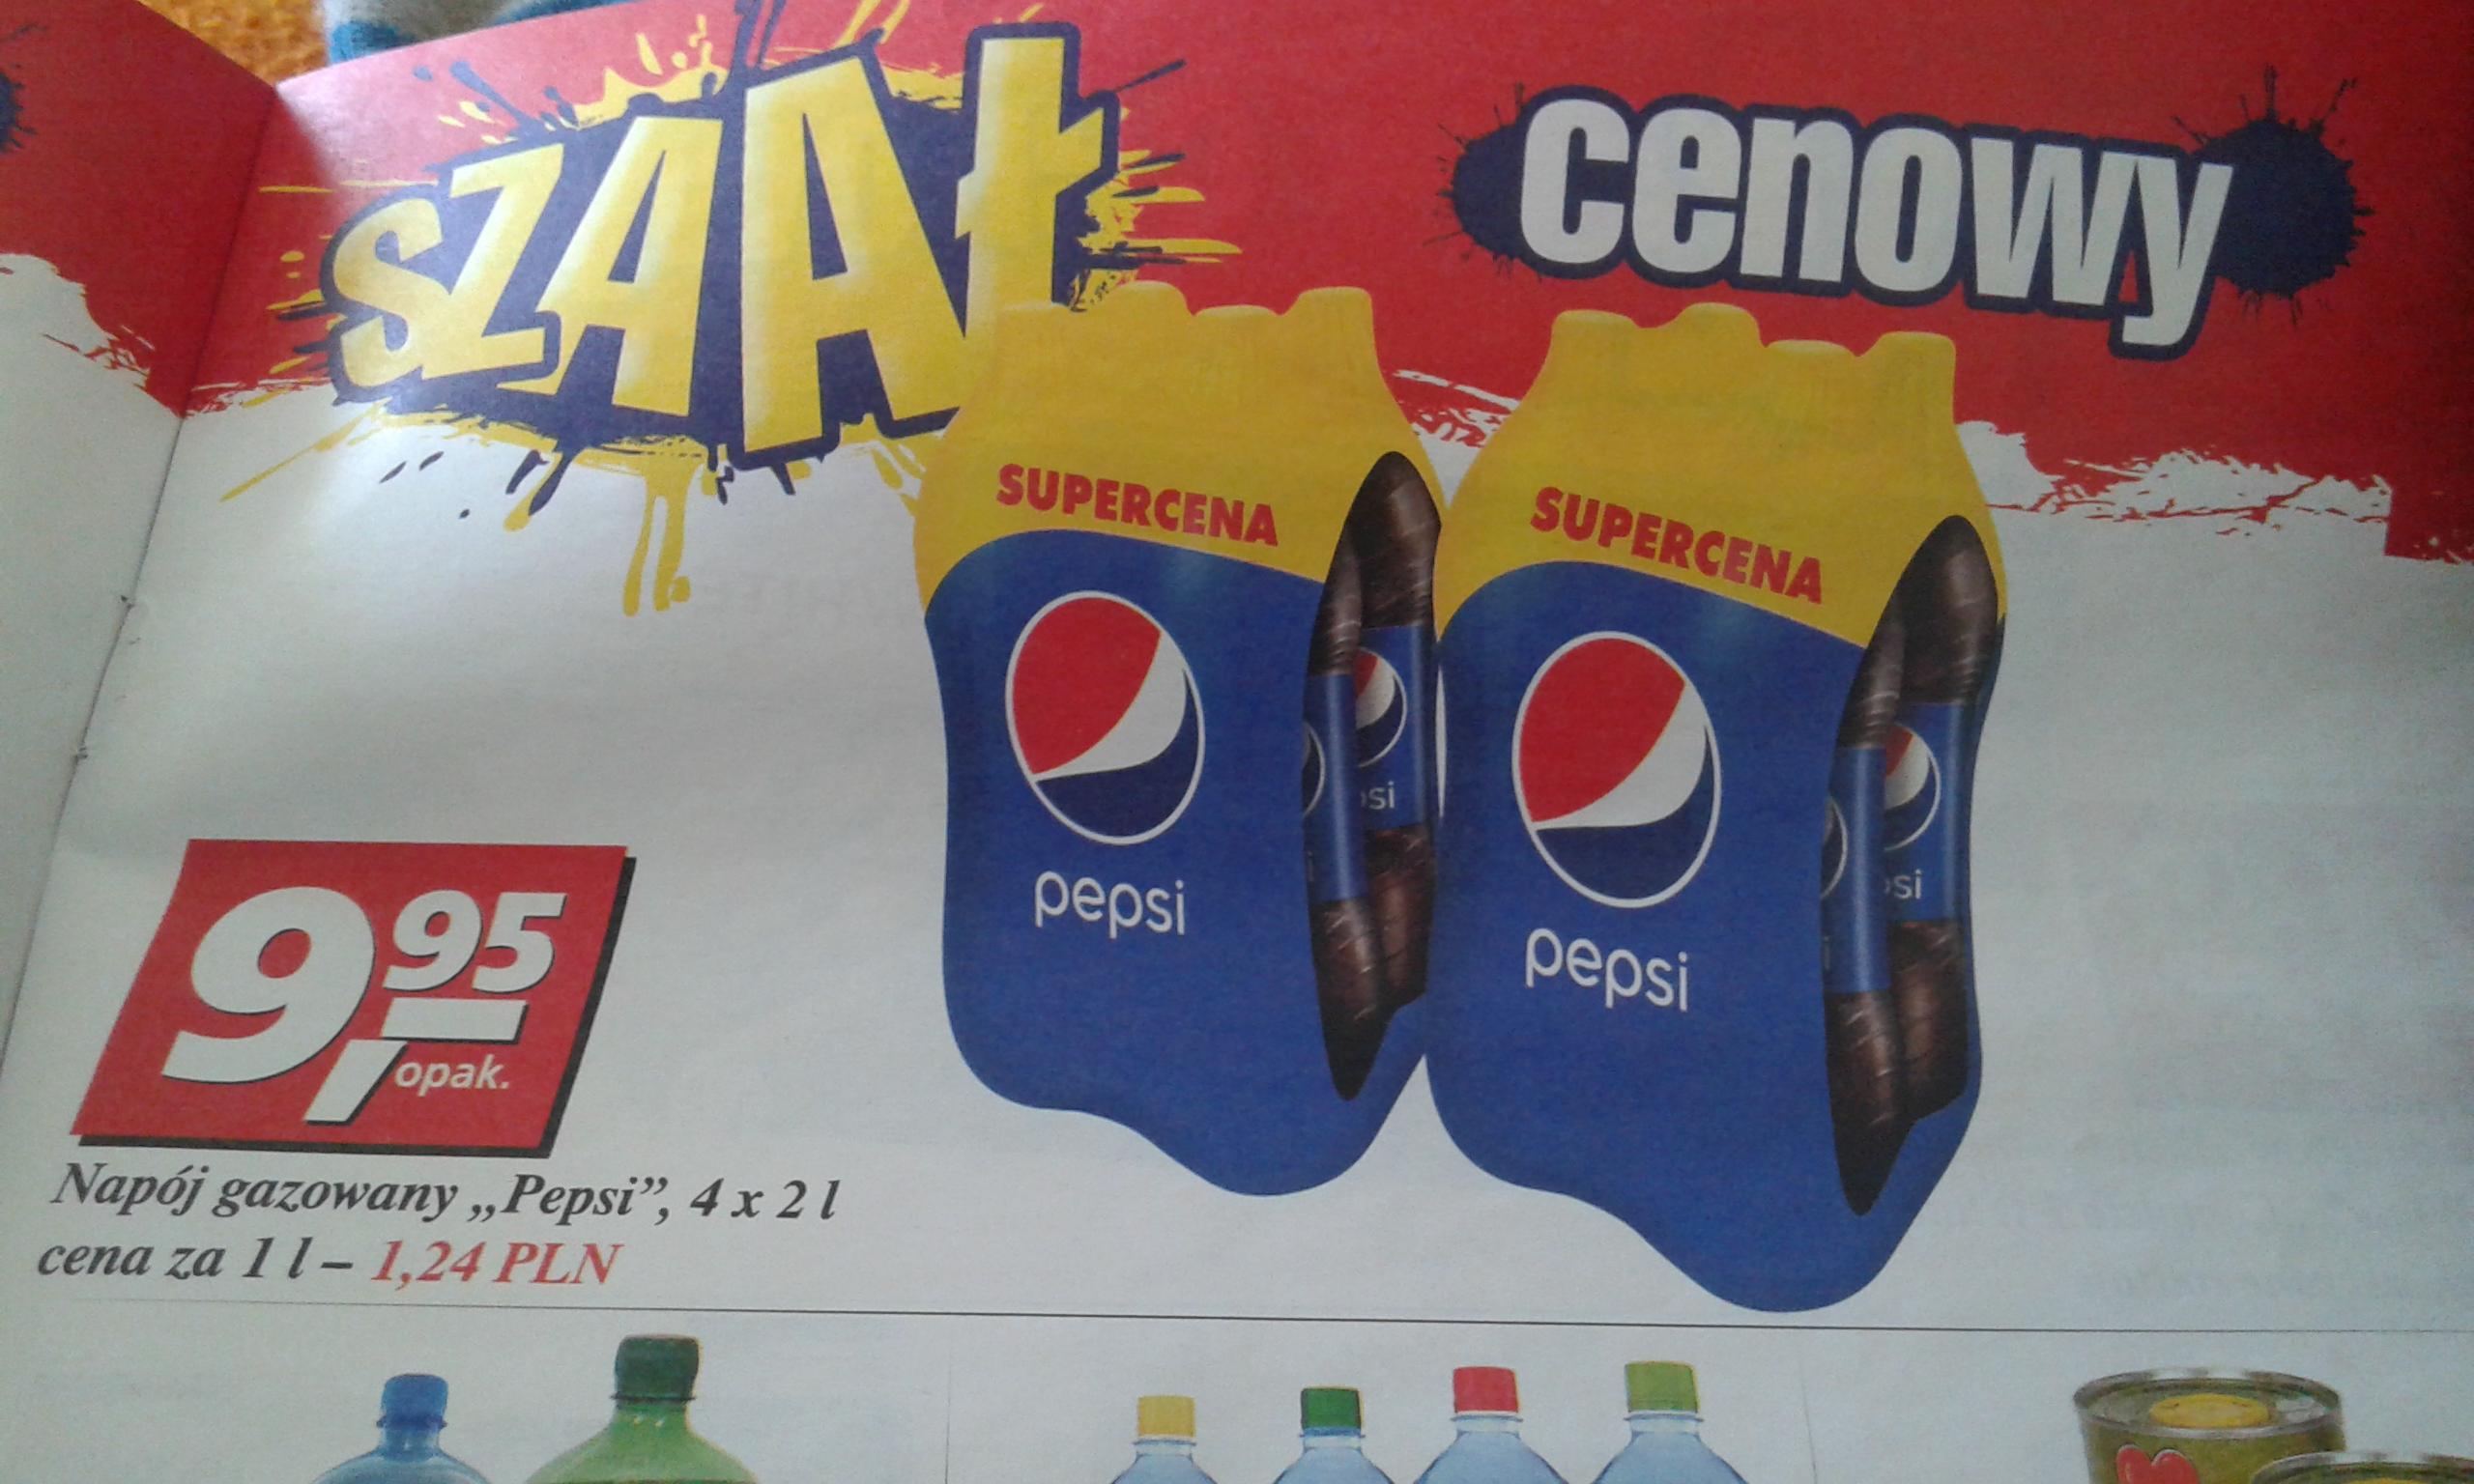 Pepsi 4x2l za 9,95zł @ Real